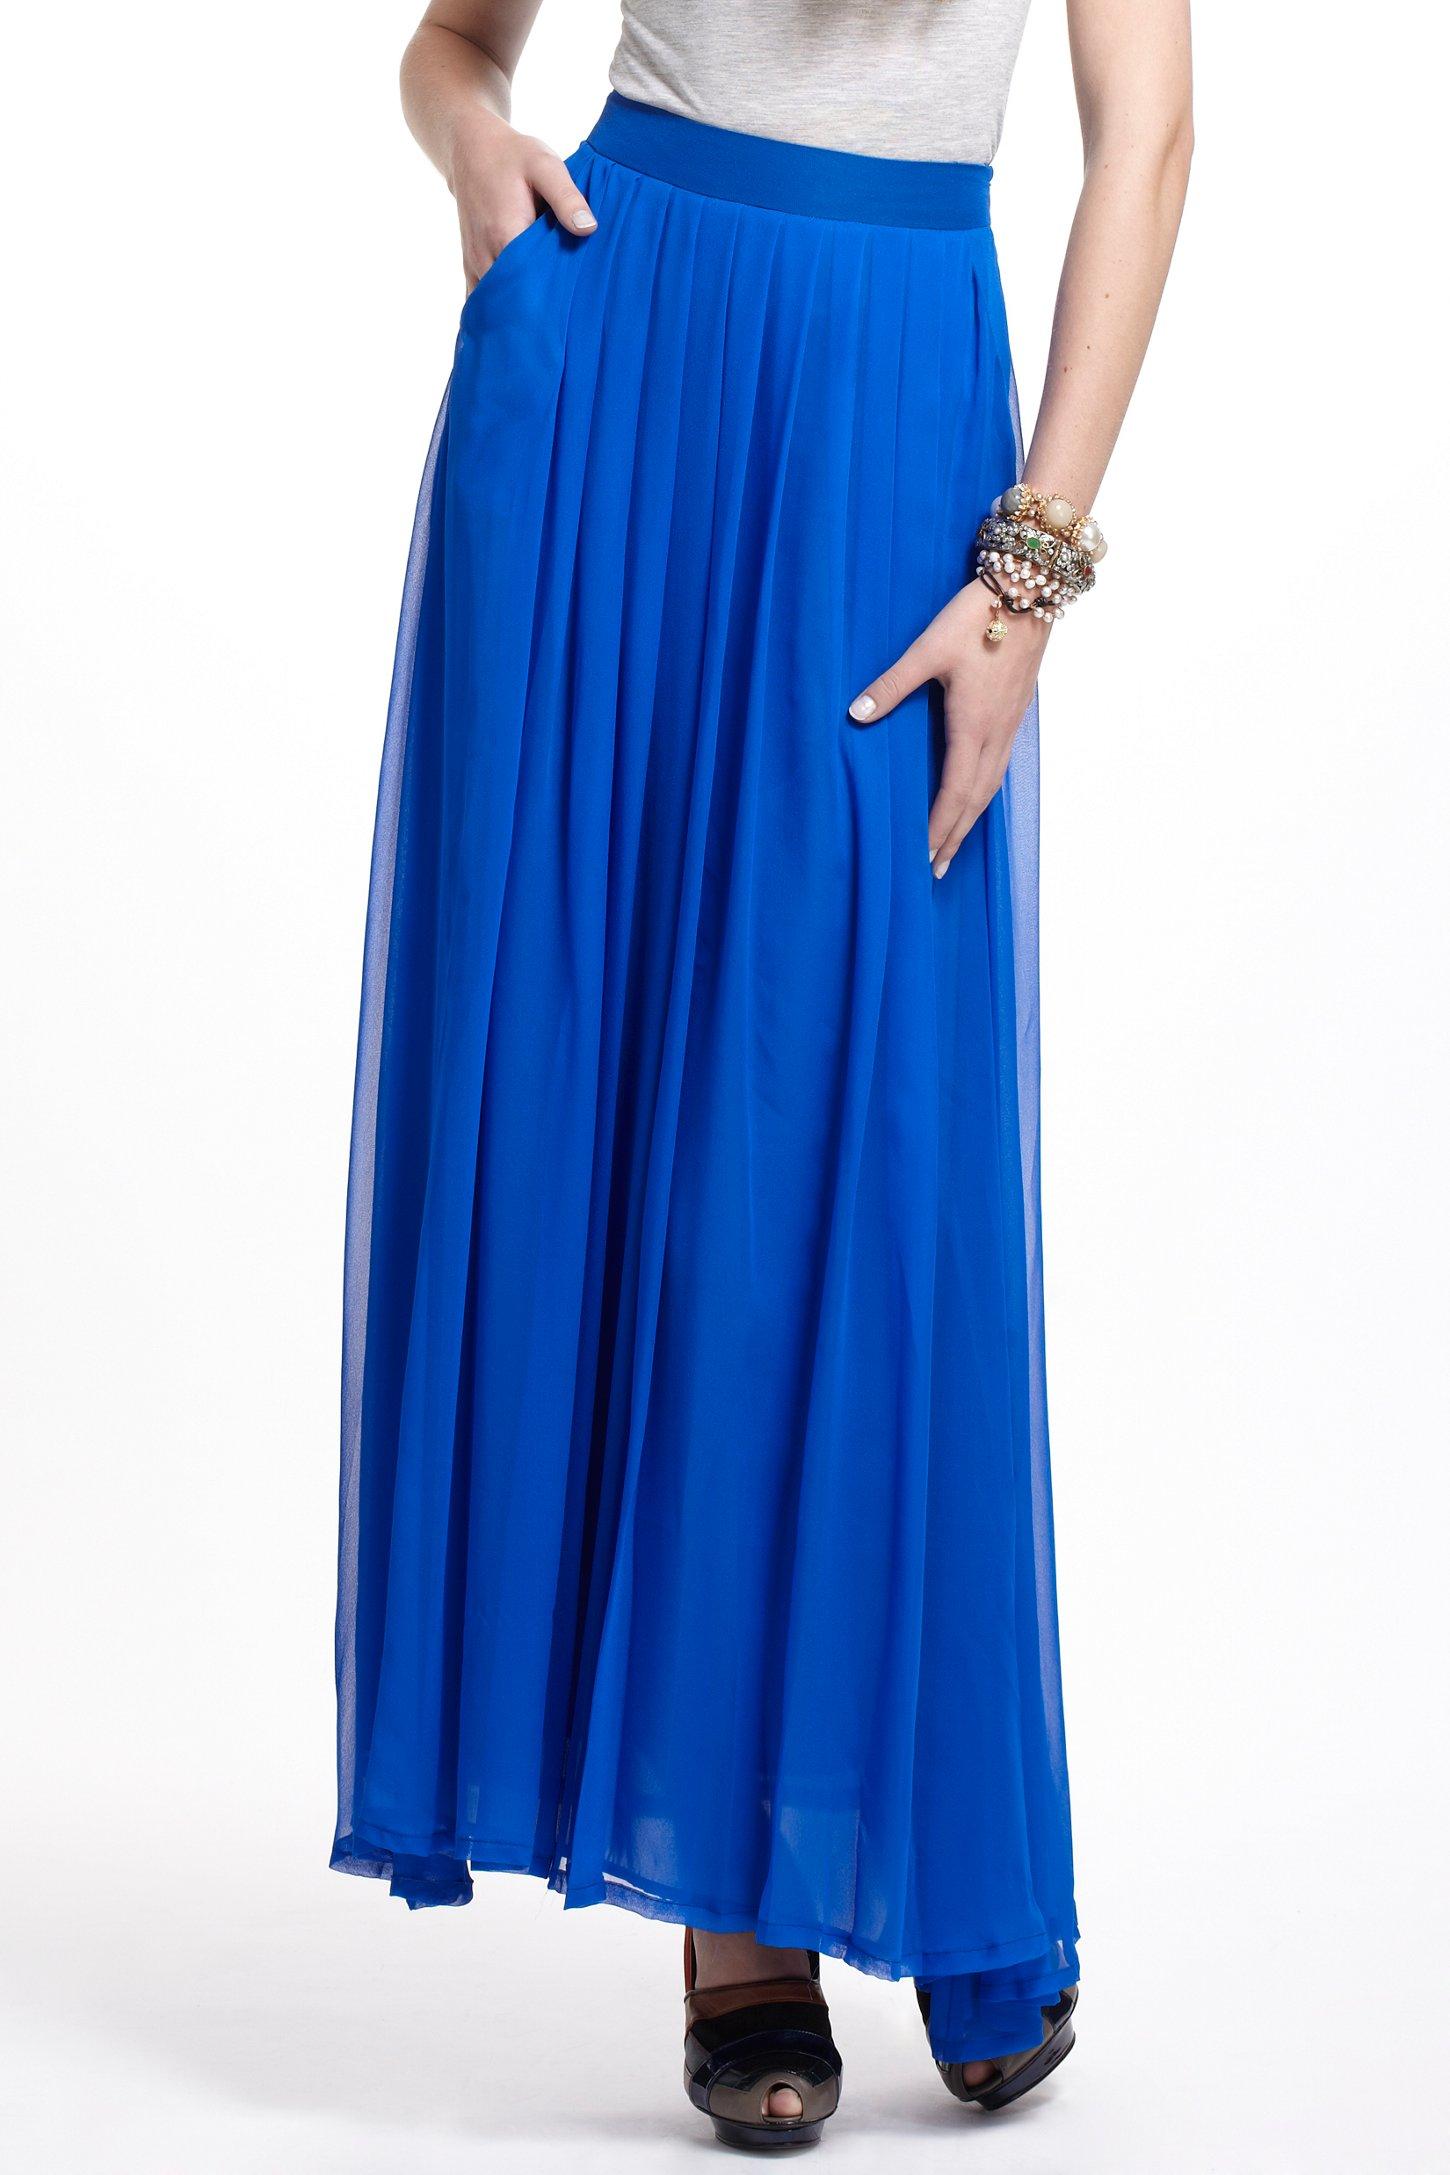 Charlie jade Aerophone Silk Maxi Skirt in Blue | Lyst